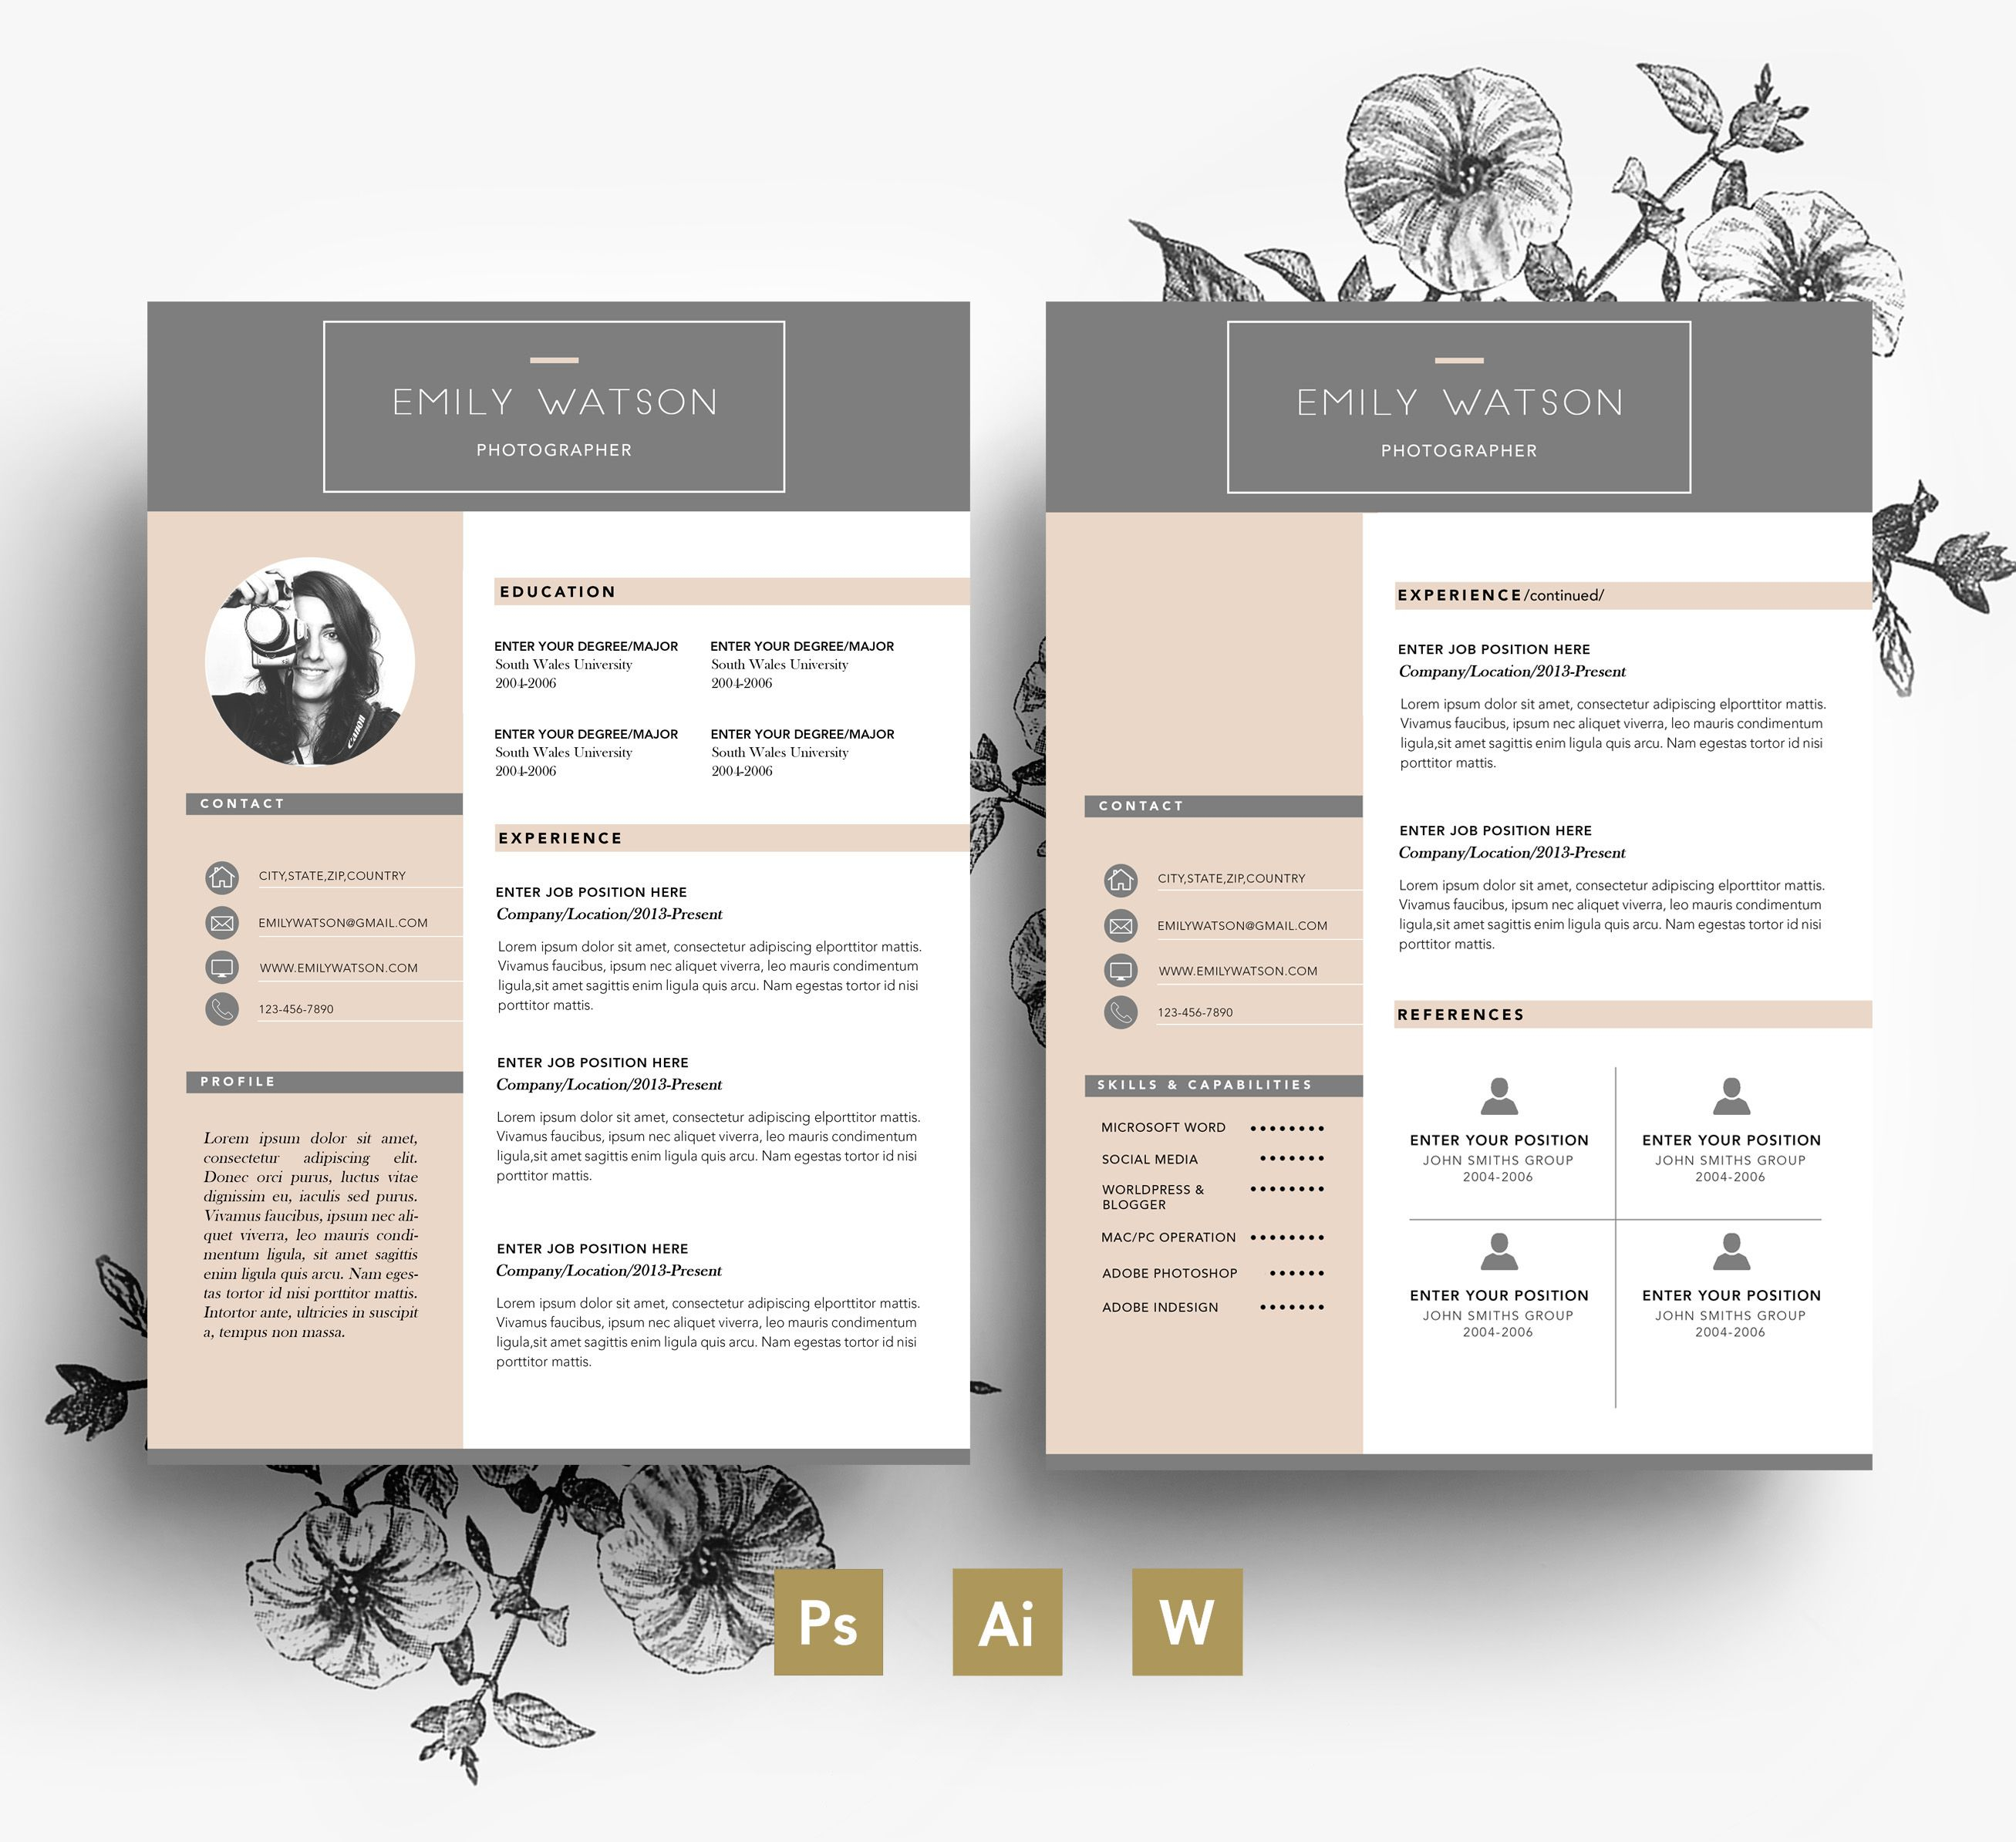 Emilyartboutique Business Card Psd Cv Template Professional Indesign Resume Template